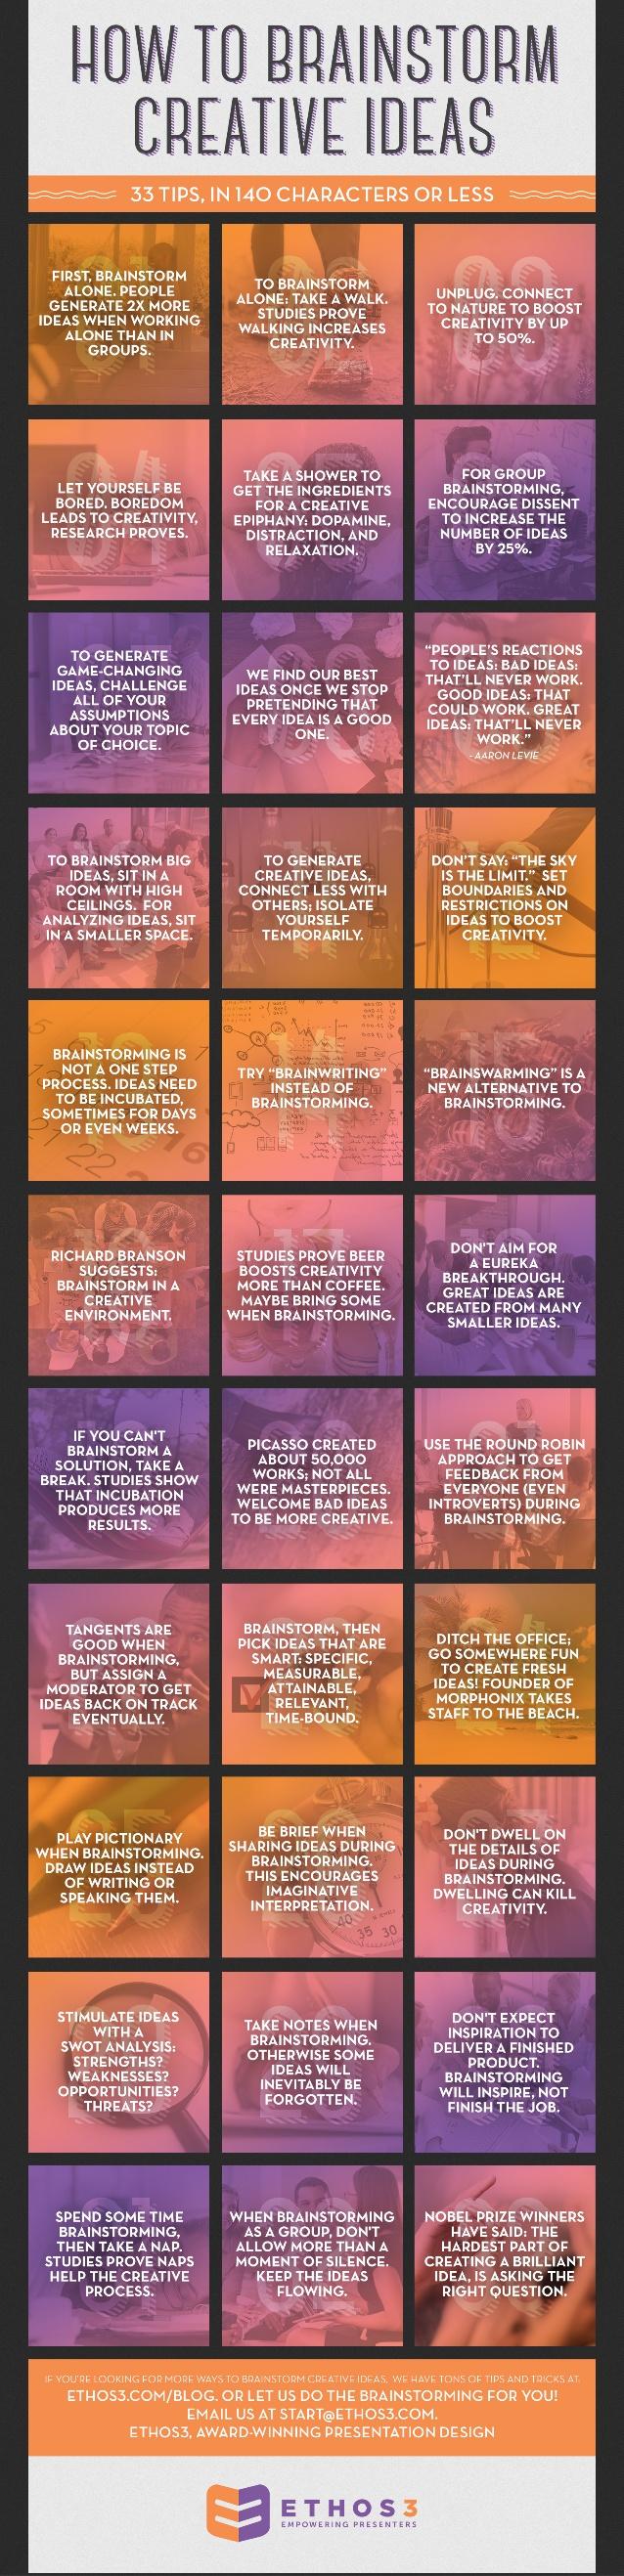 33 consejos sobre Brainstorming en 140 caracteres